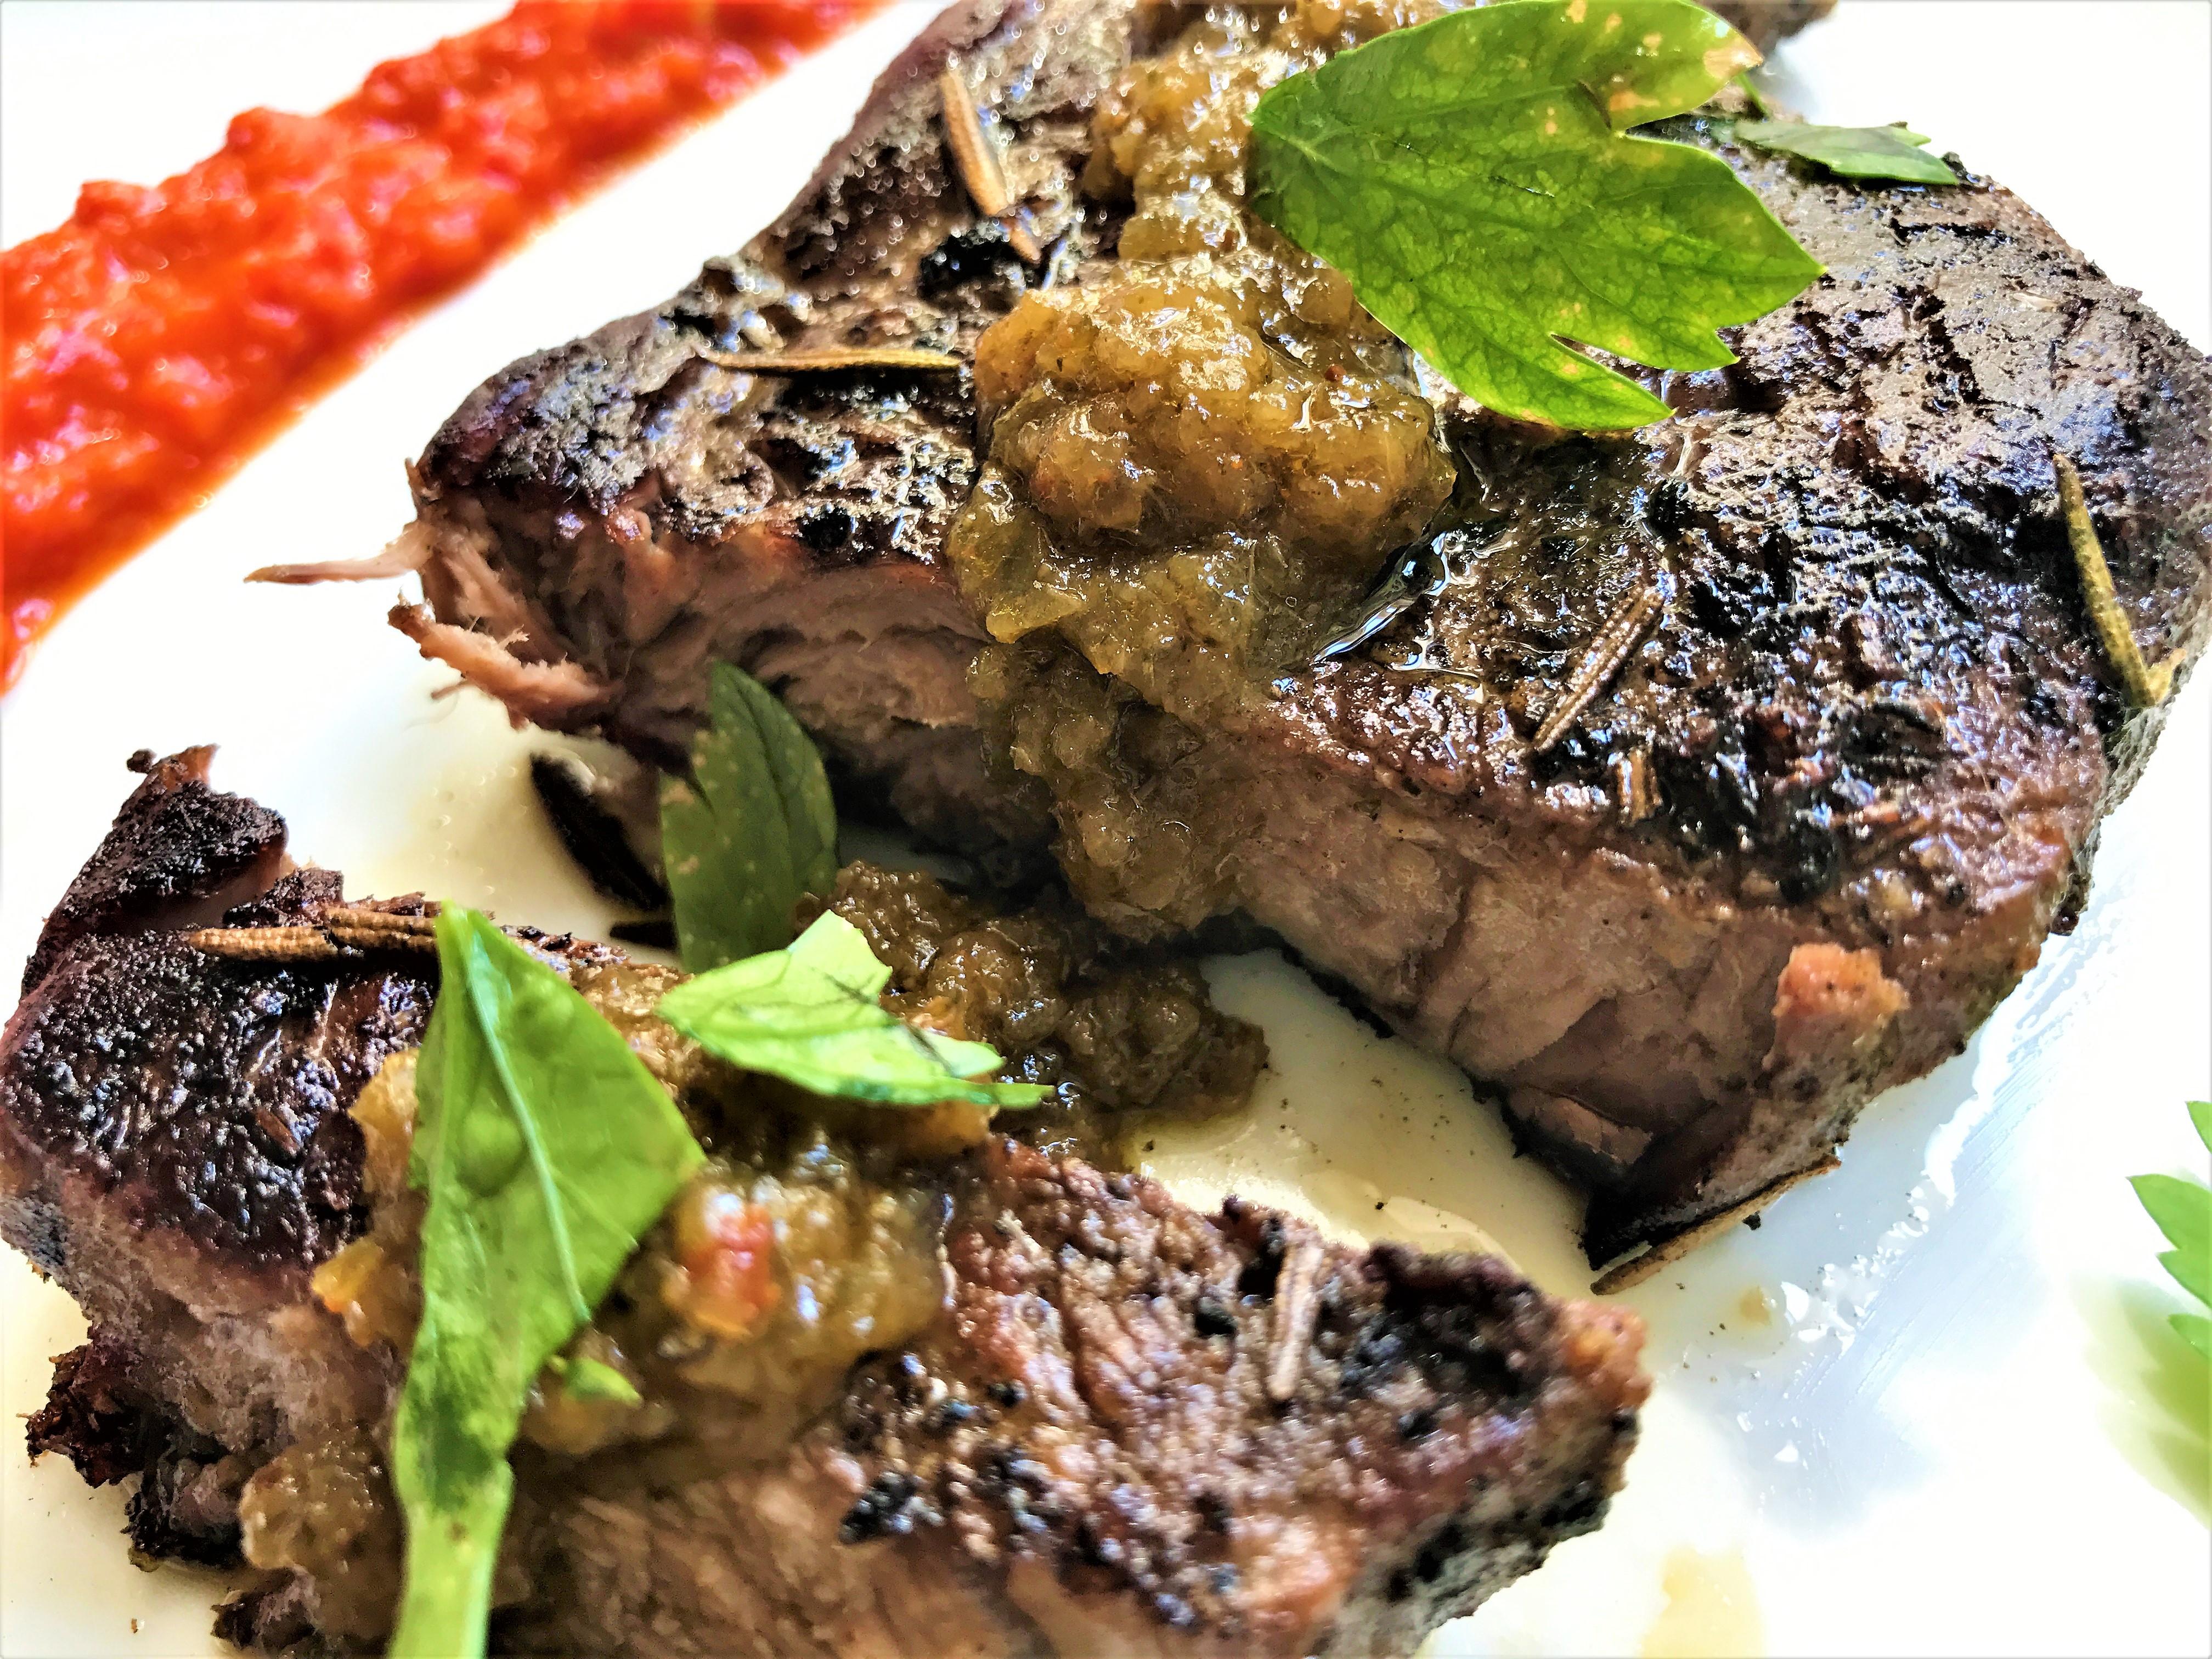 az_igazi_steak3.JPG